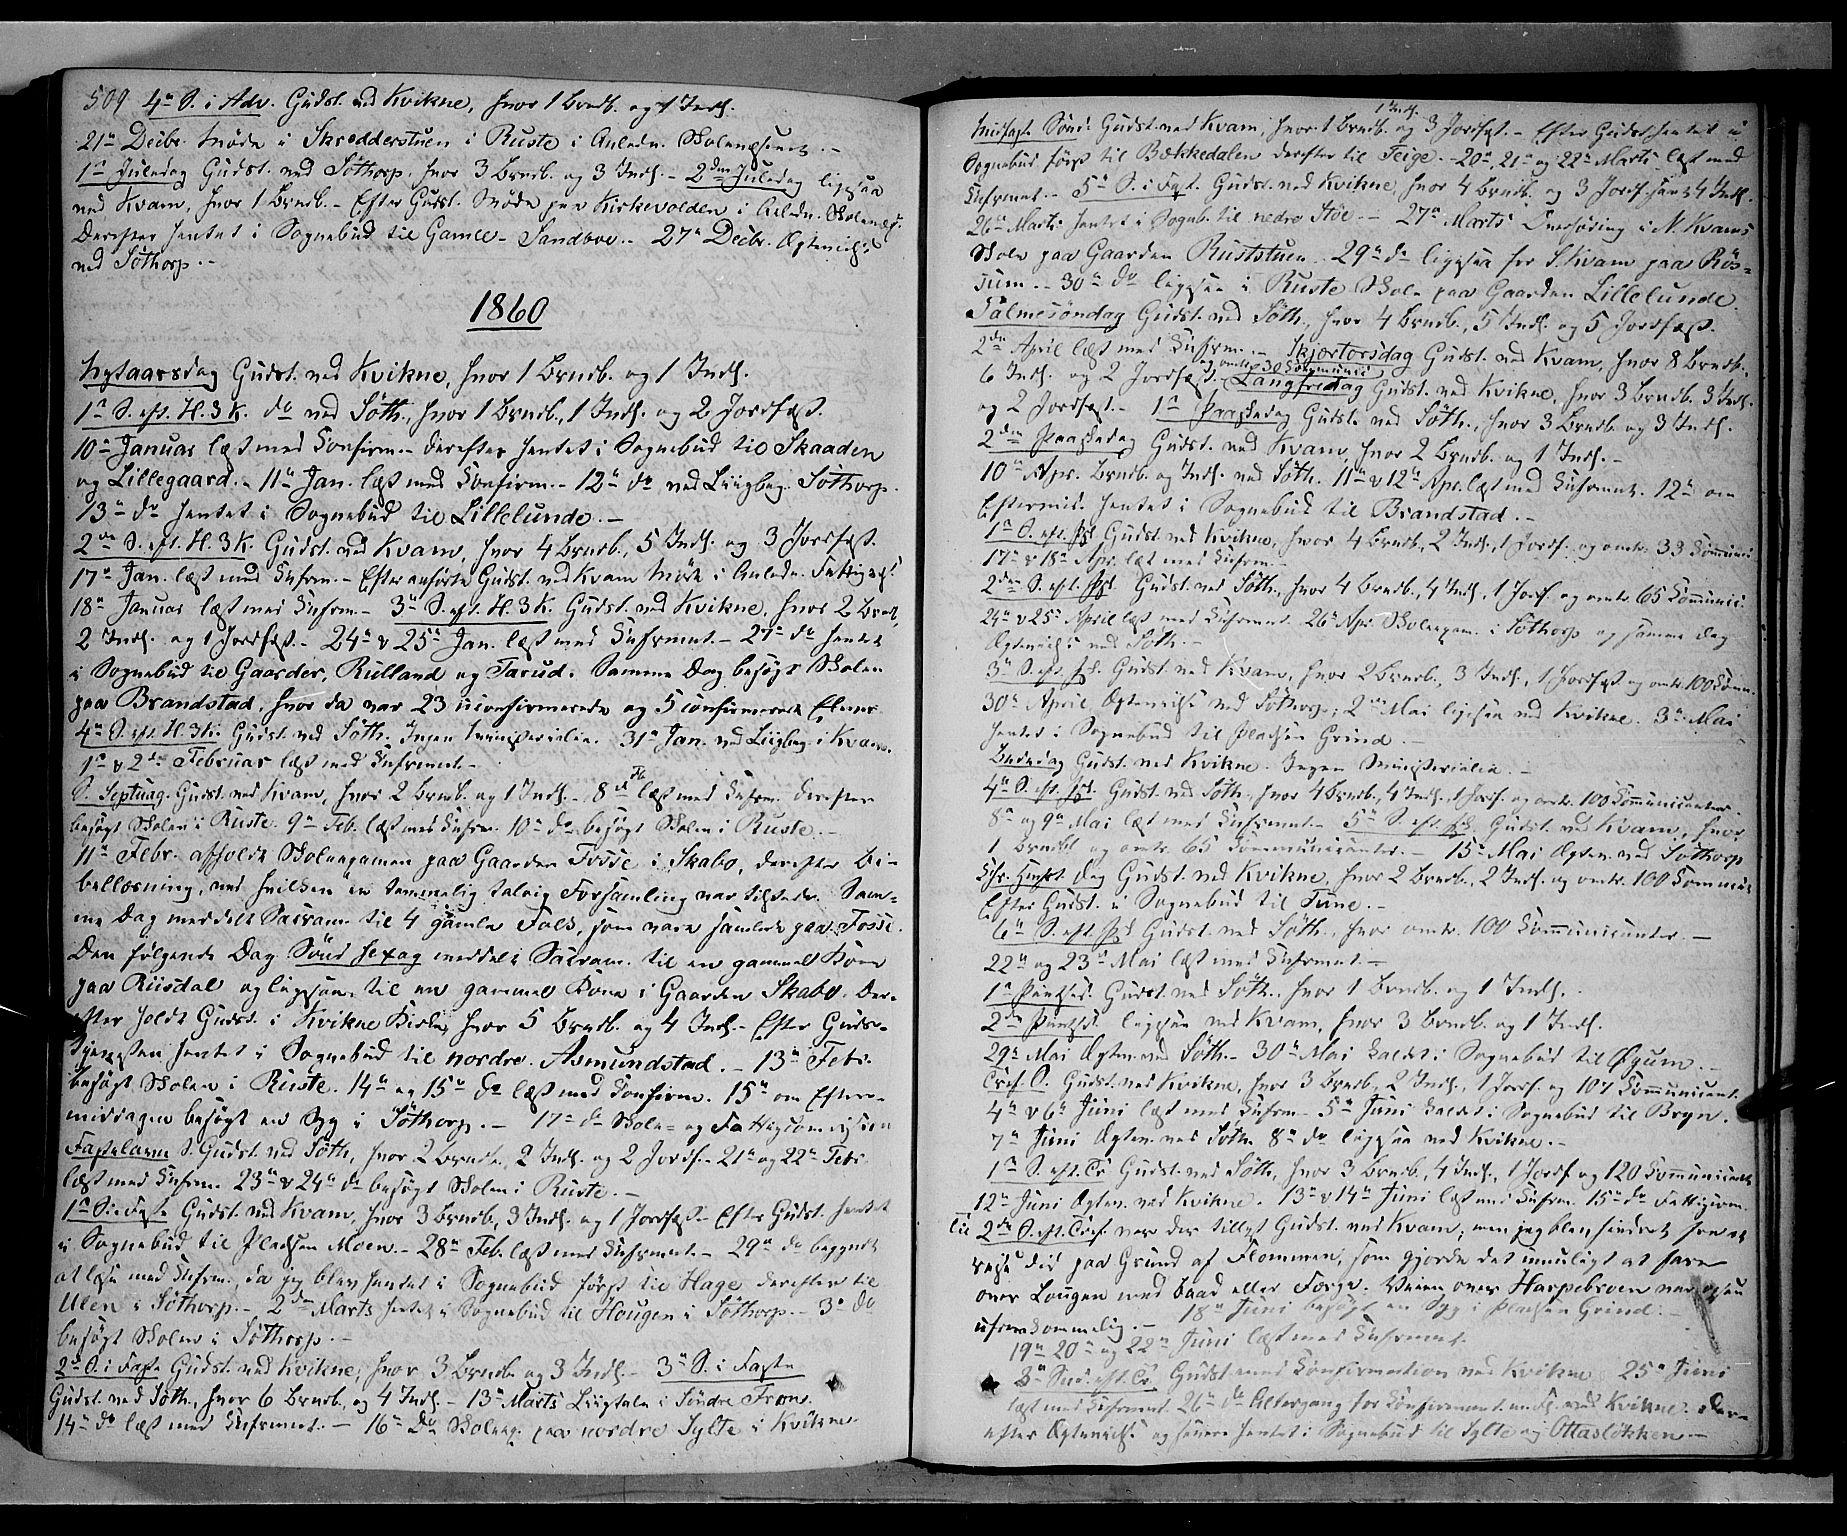 SAH, Nord-Fron prestekontor, Ministerialbok nr. 1, 1851-1864, s. 509